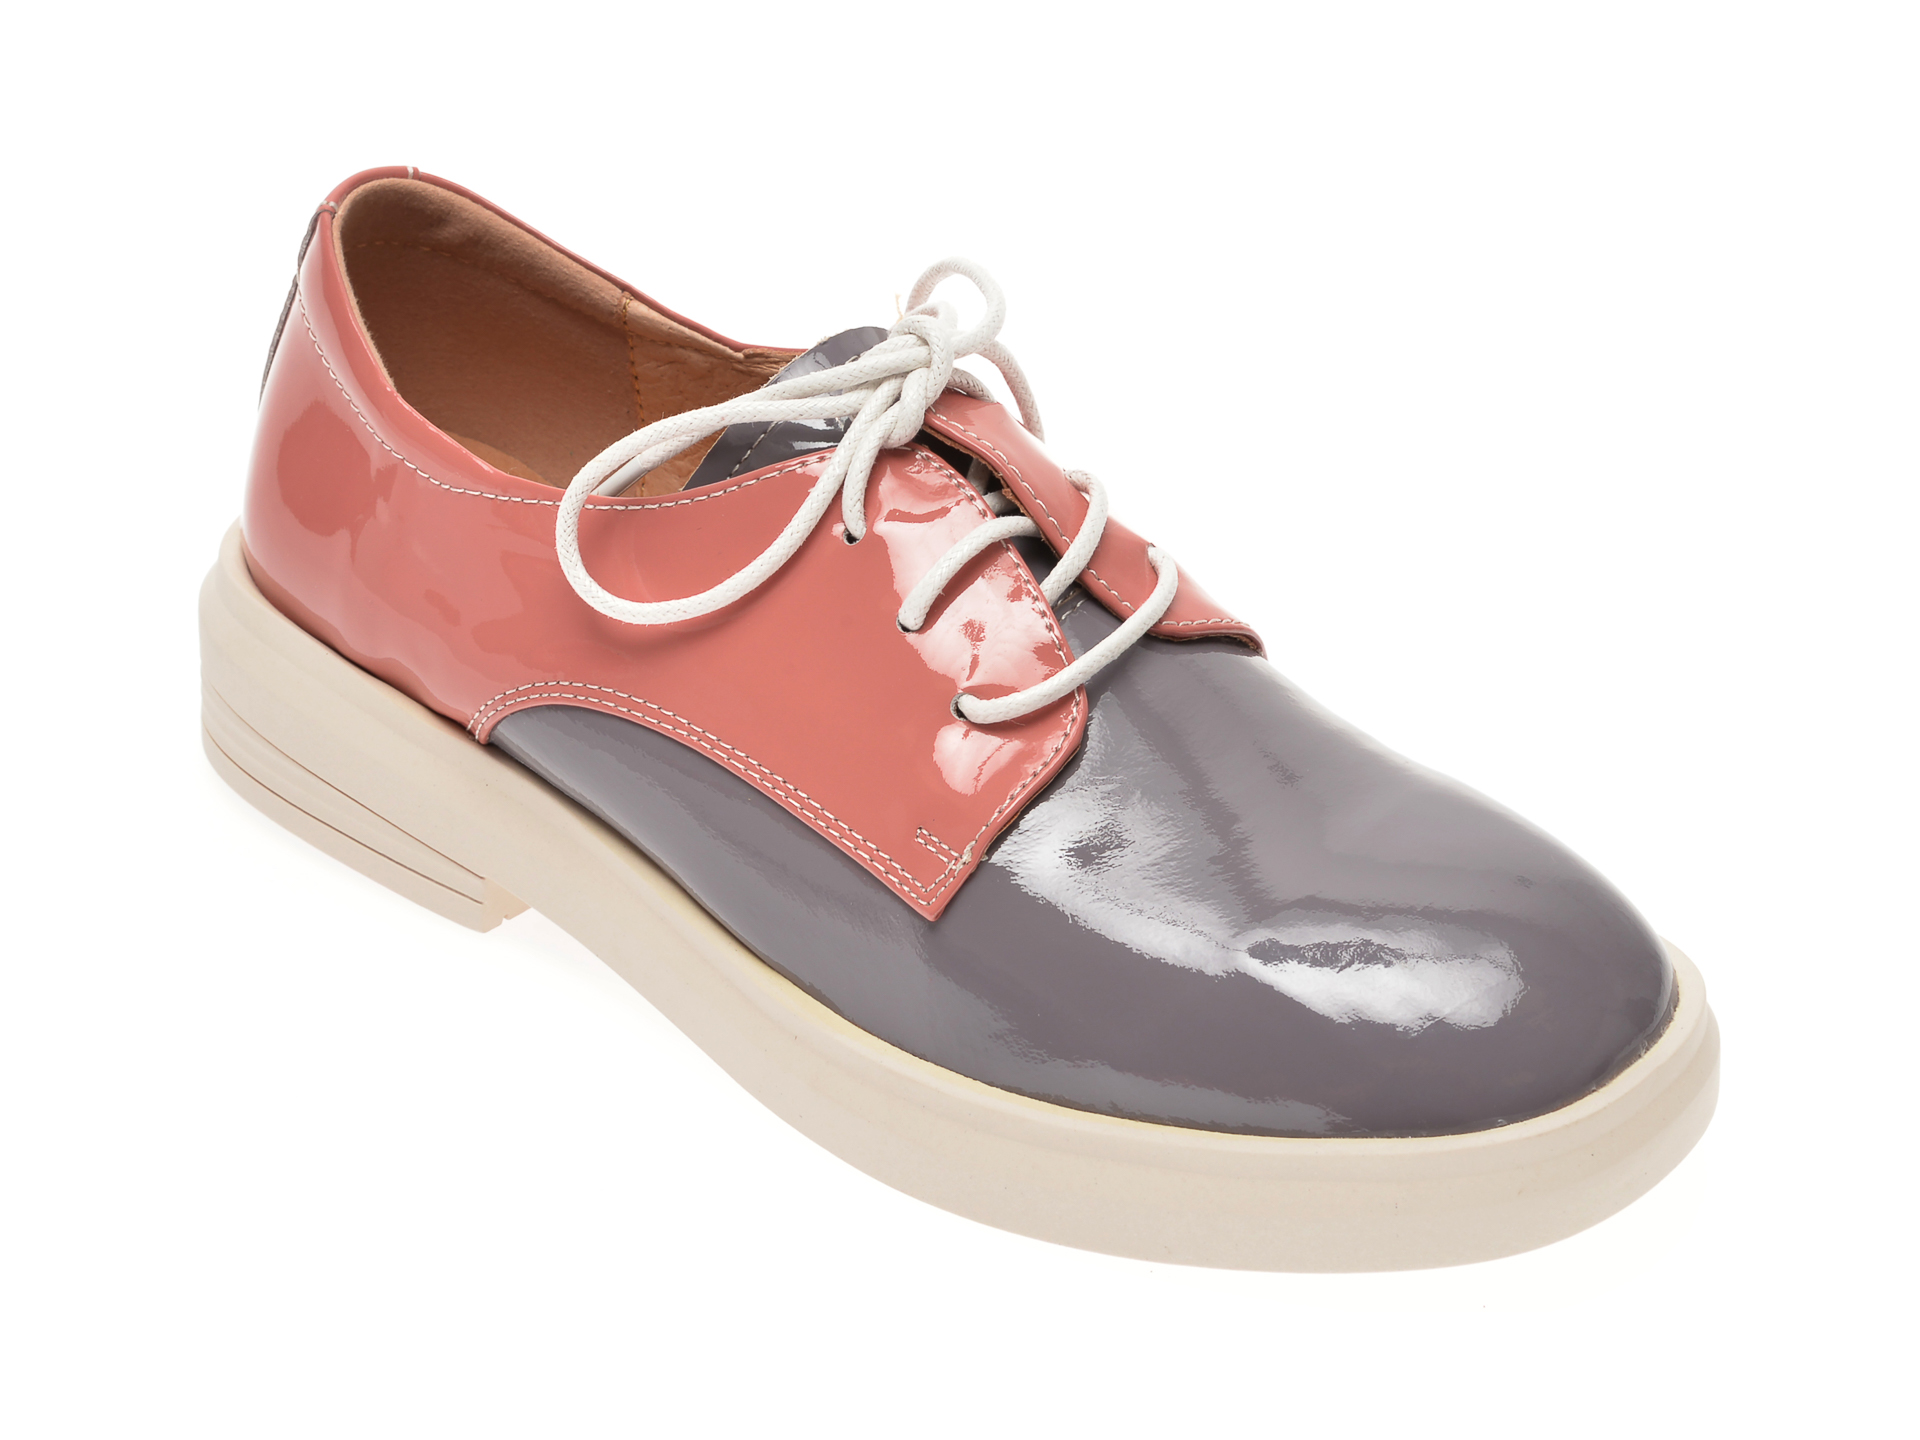 Pantofi PASS COLLECTION gri, 19118, din lac piele